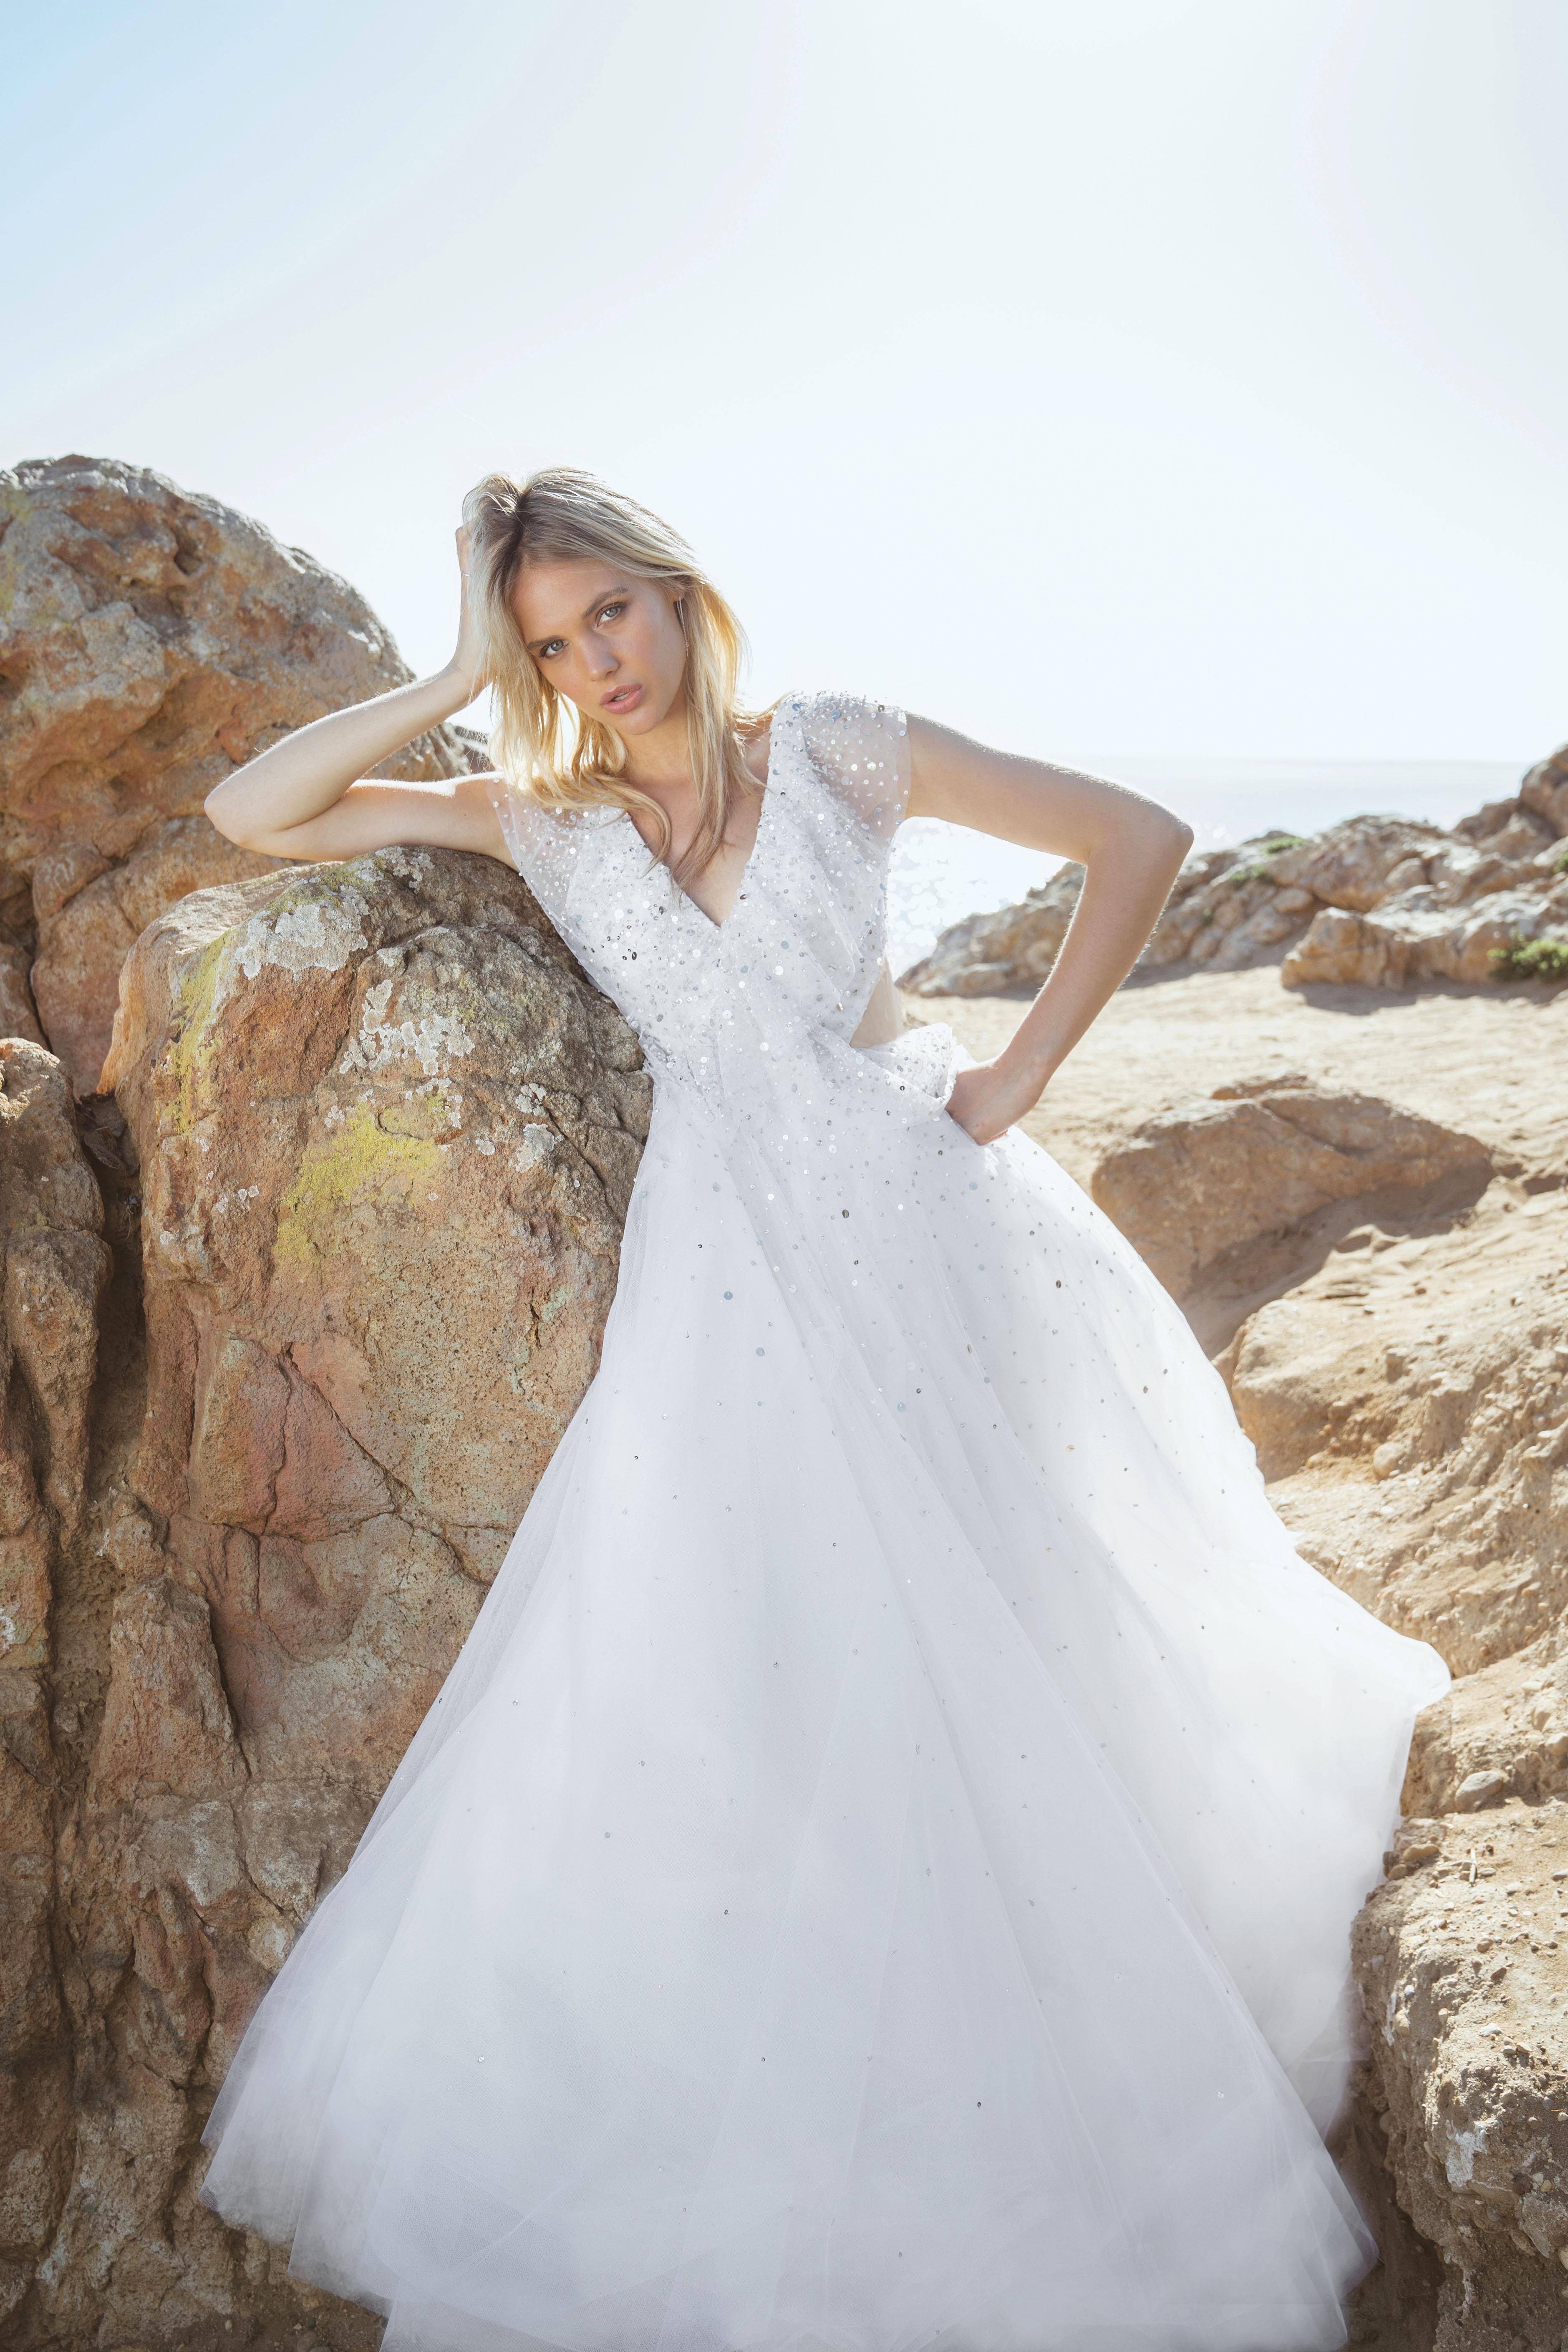 sabrina dahan v-neck short sleeves sparkly wedding dress spring 2018